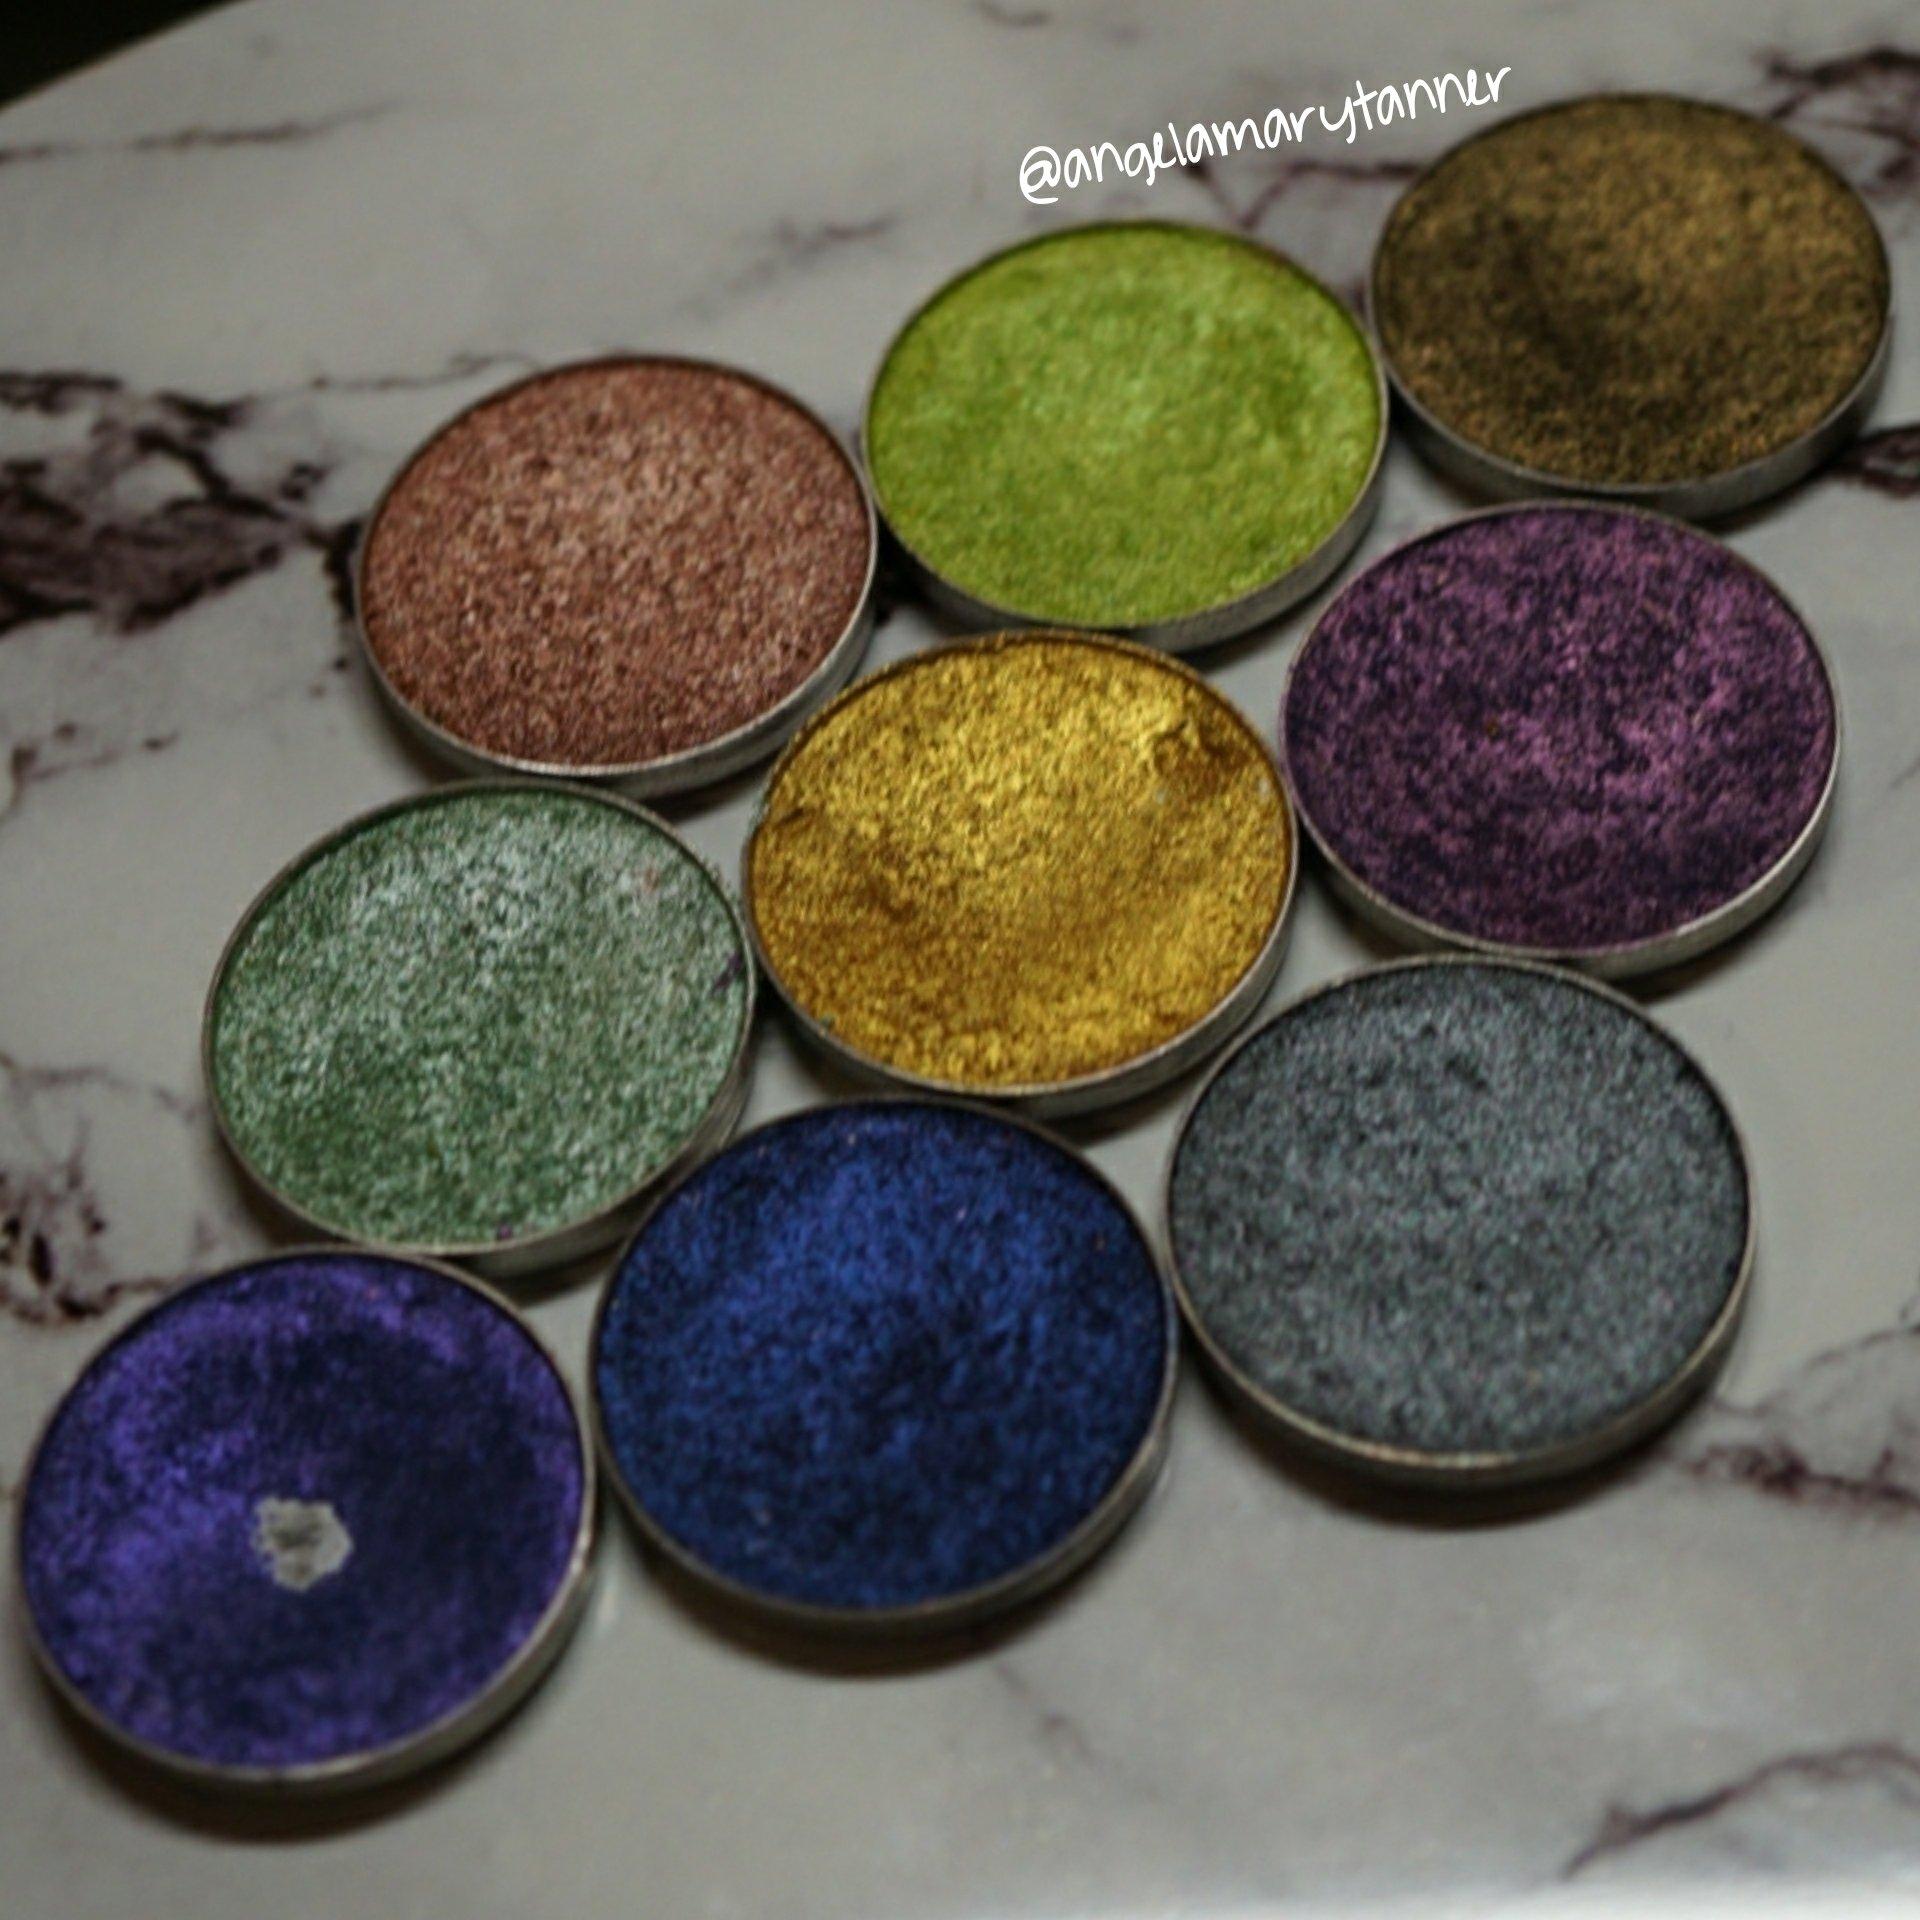 Makeup Geek Mardi Gras Foiled Kit Swatches